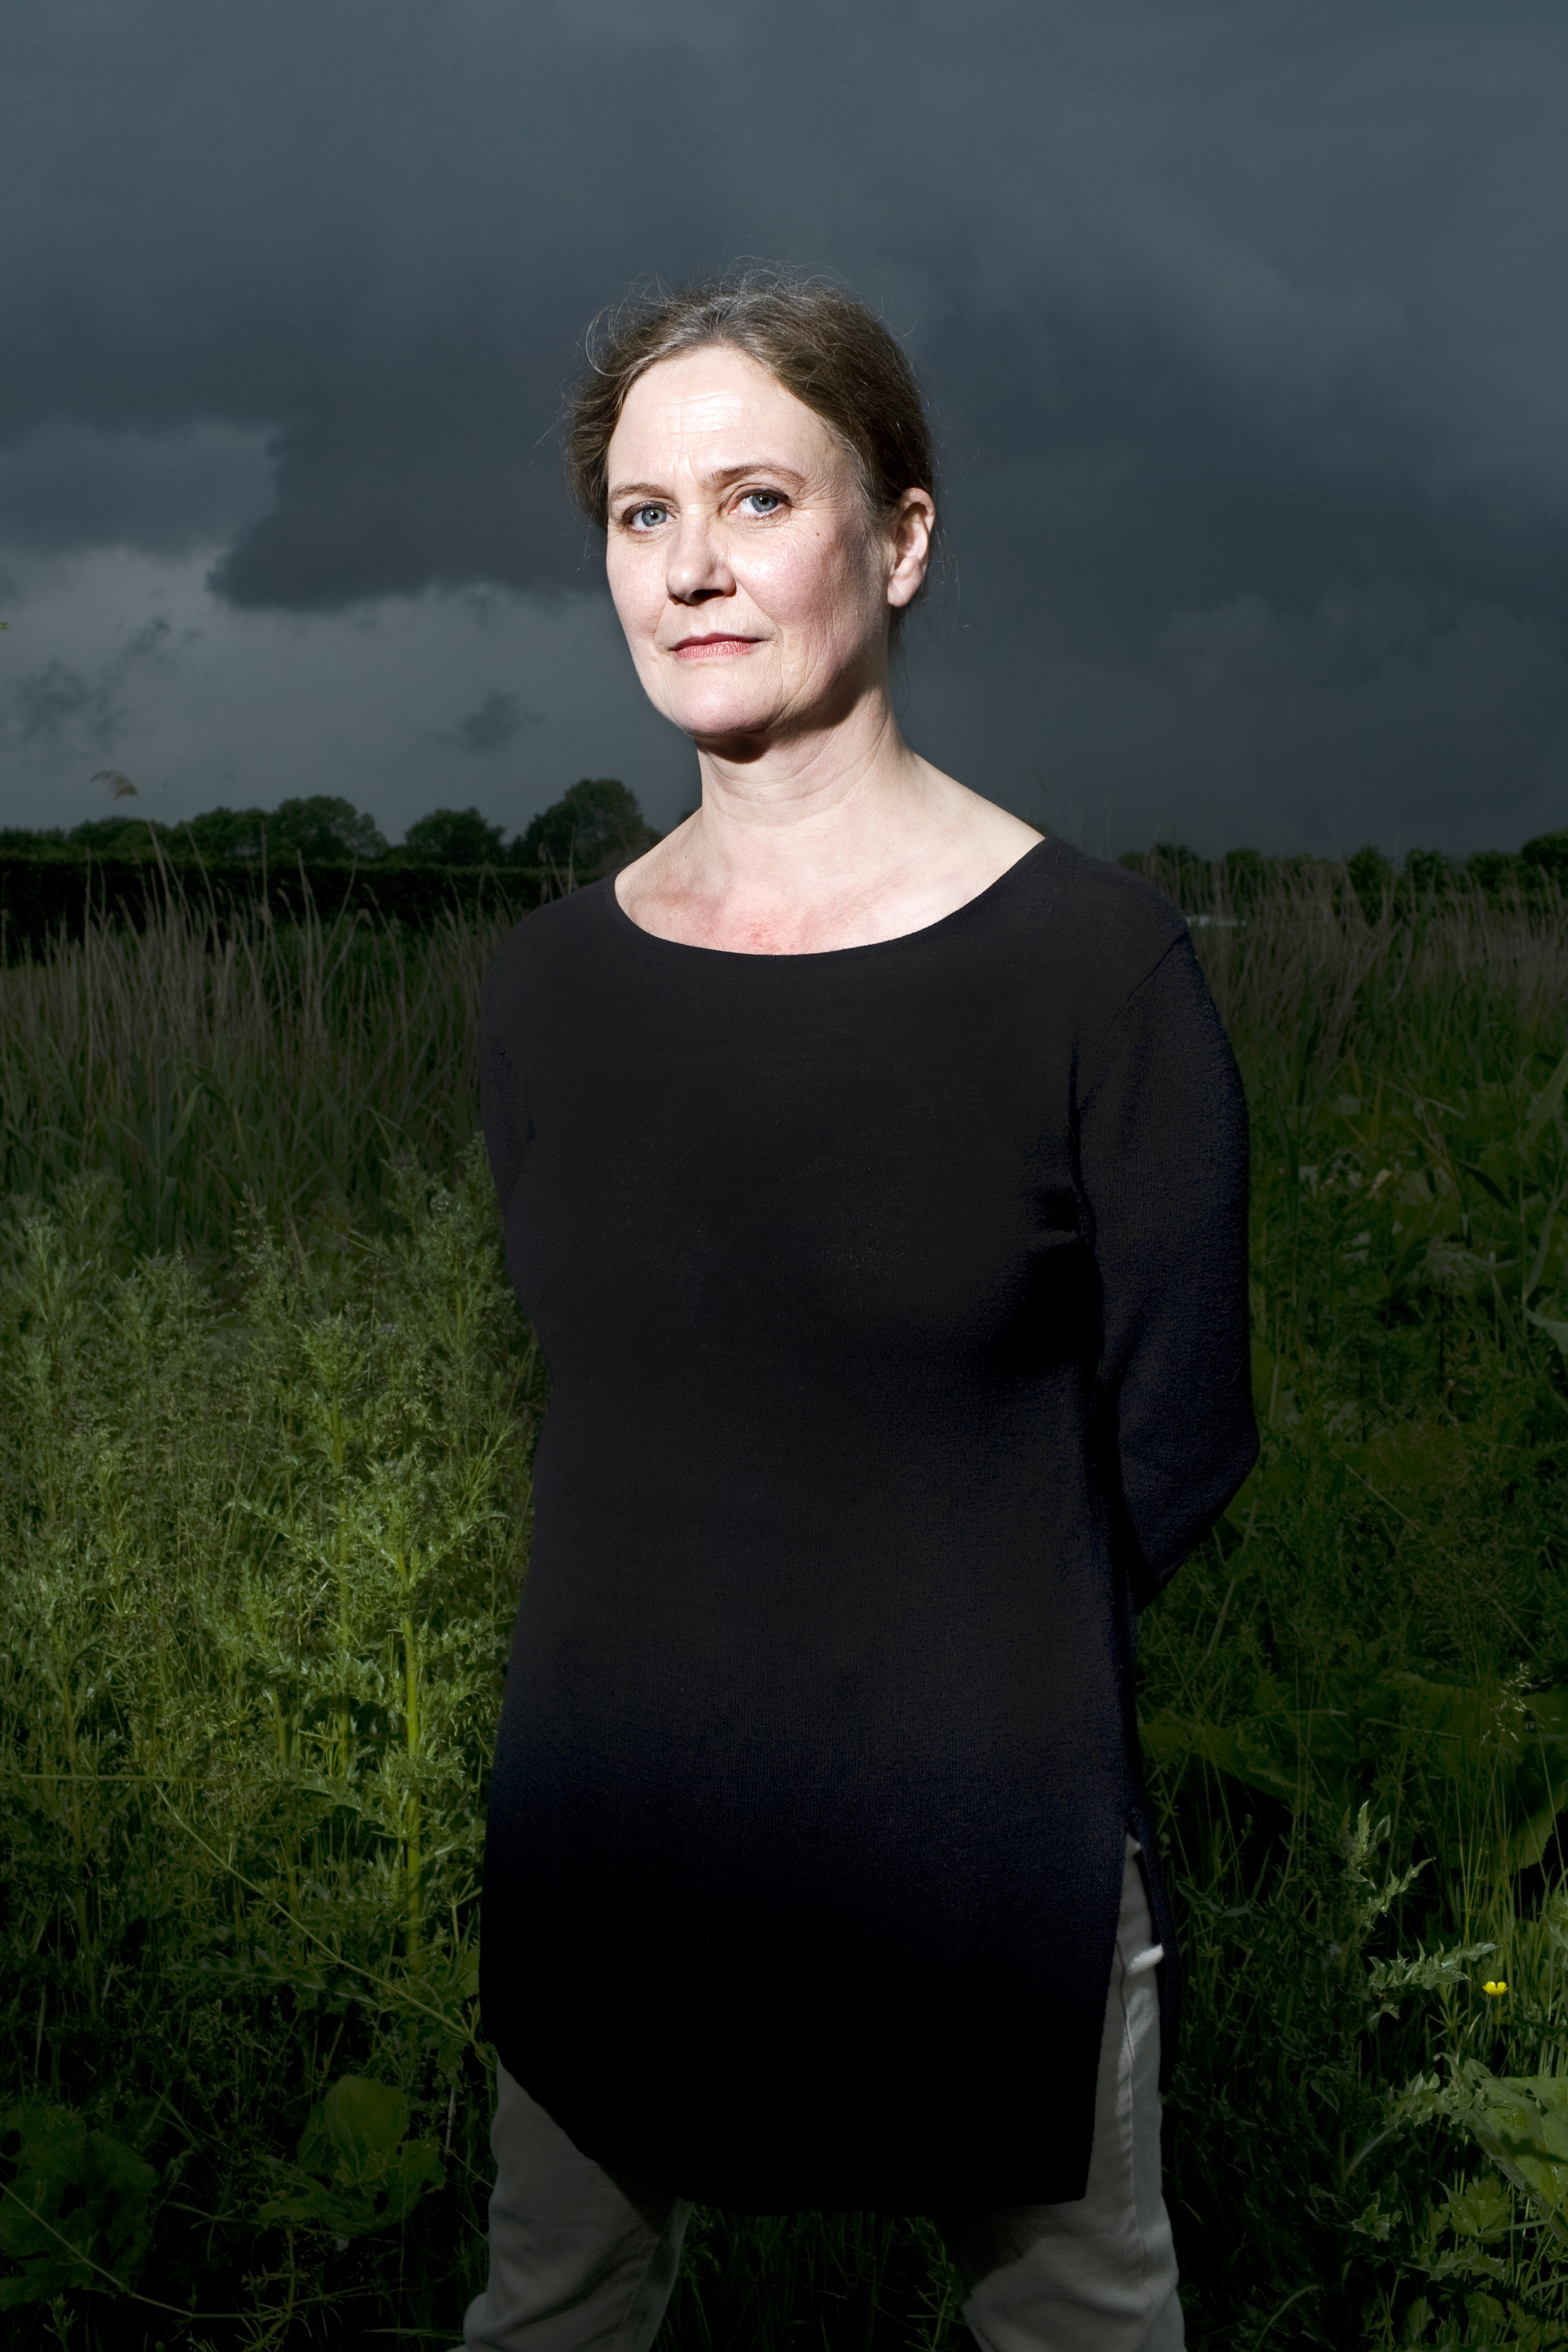 Marie Christine de Both